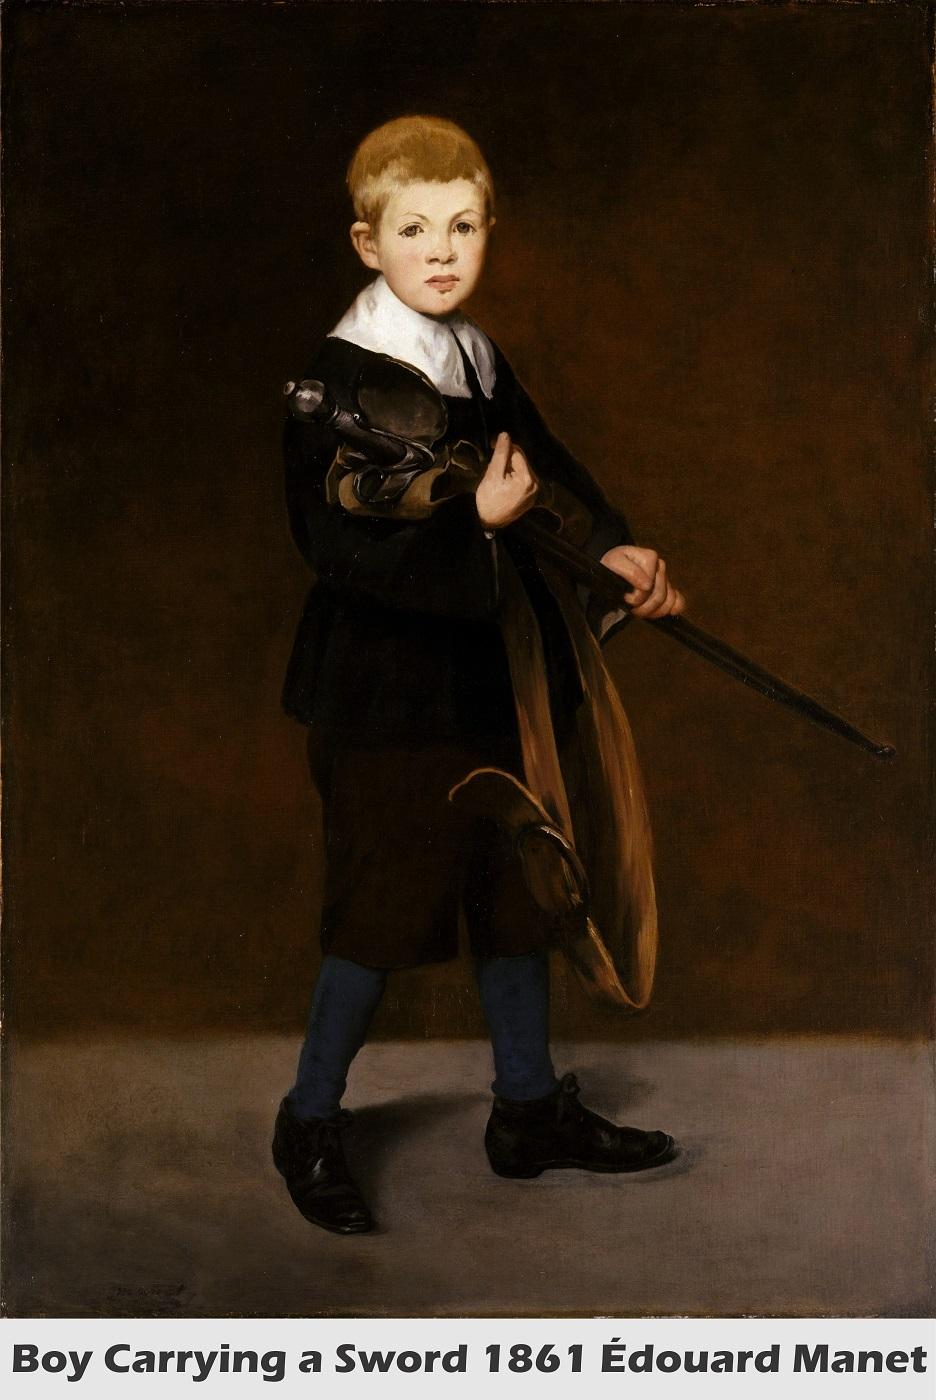 Boy Carrying a Sword by Édouard Manet